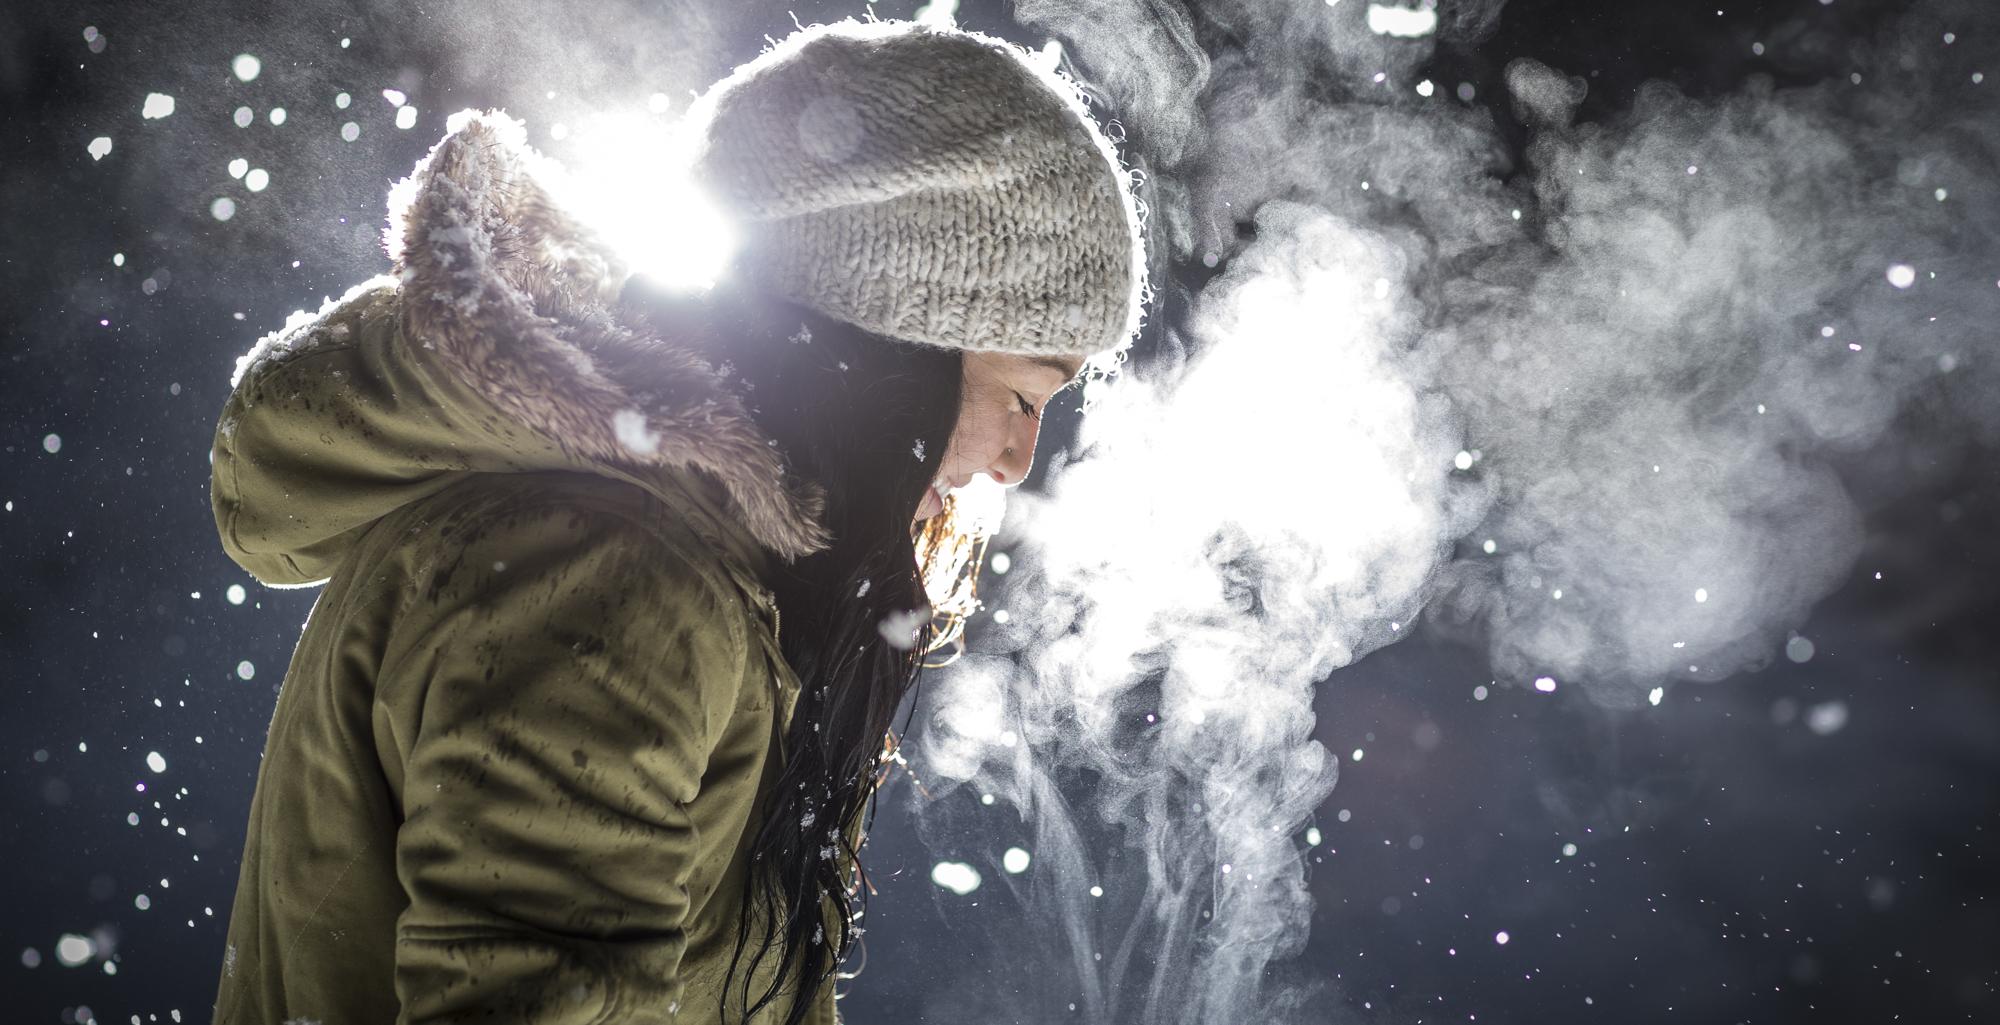 Julie Felsher, winter, pleasure, be weightless